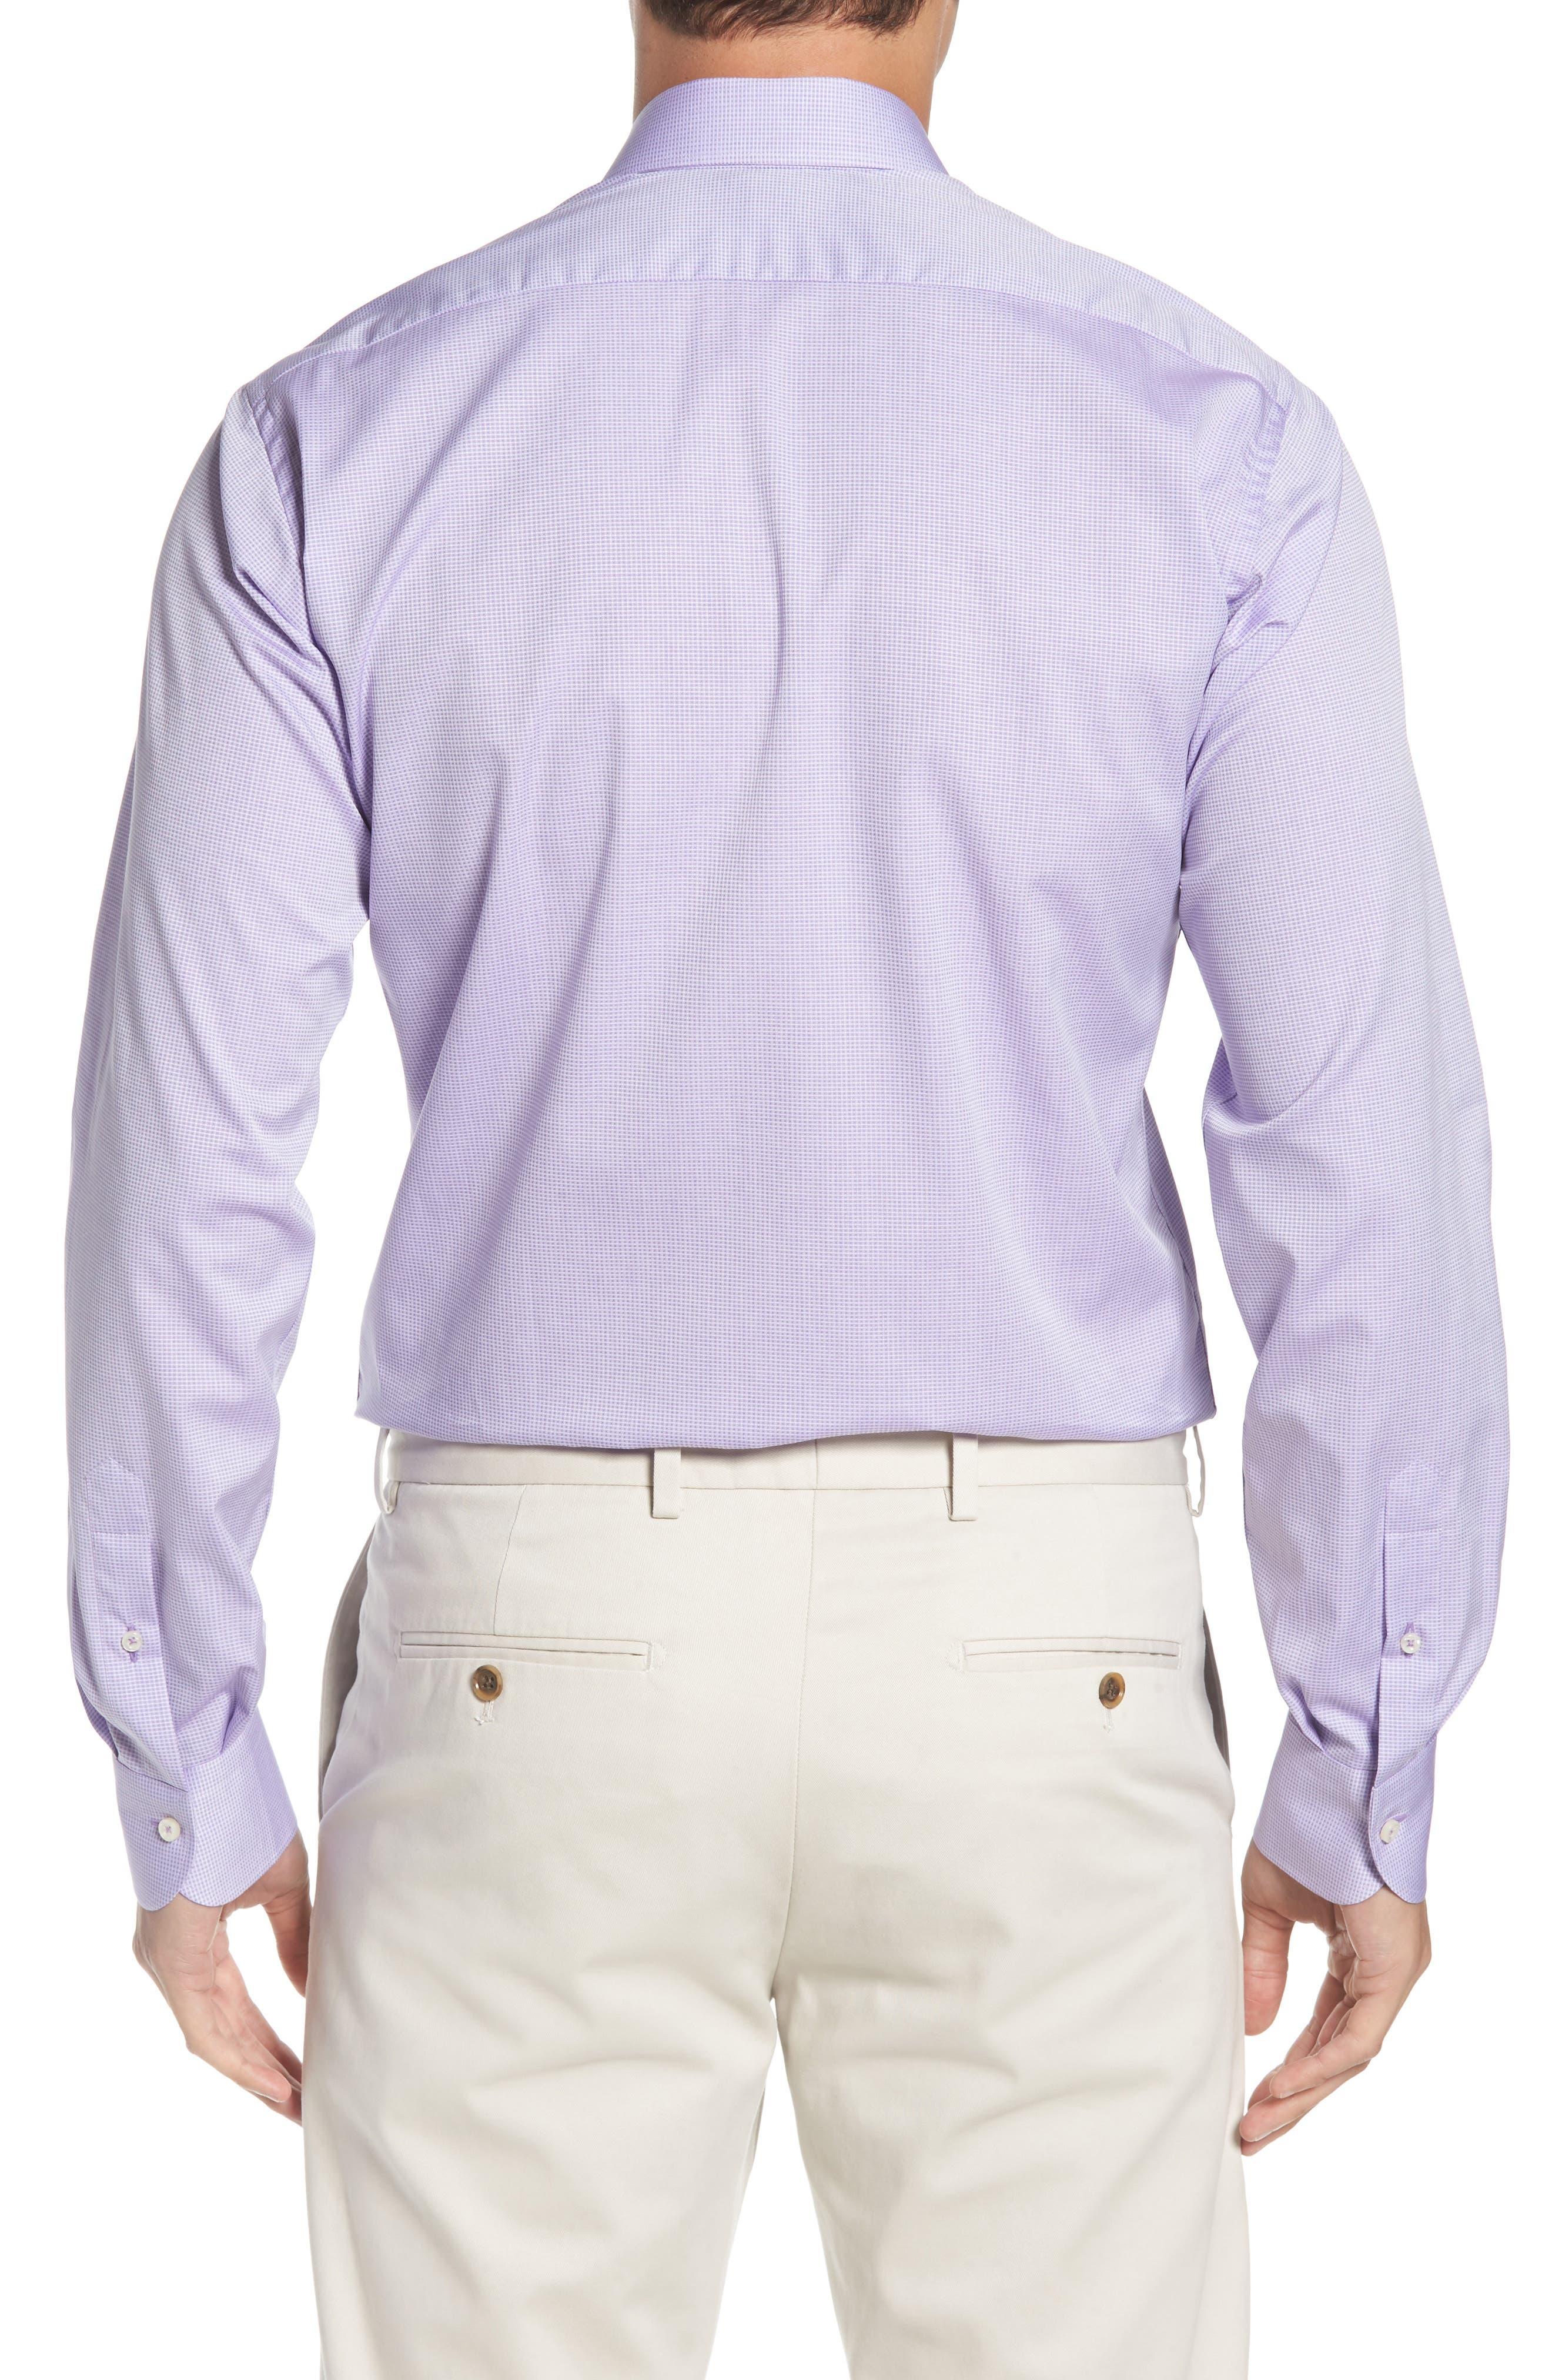 Regular Fit Solid Dress Shirt,                             Alternate thumbnail 3, color,                             500